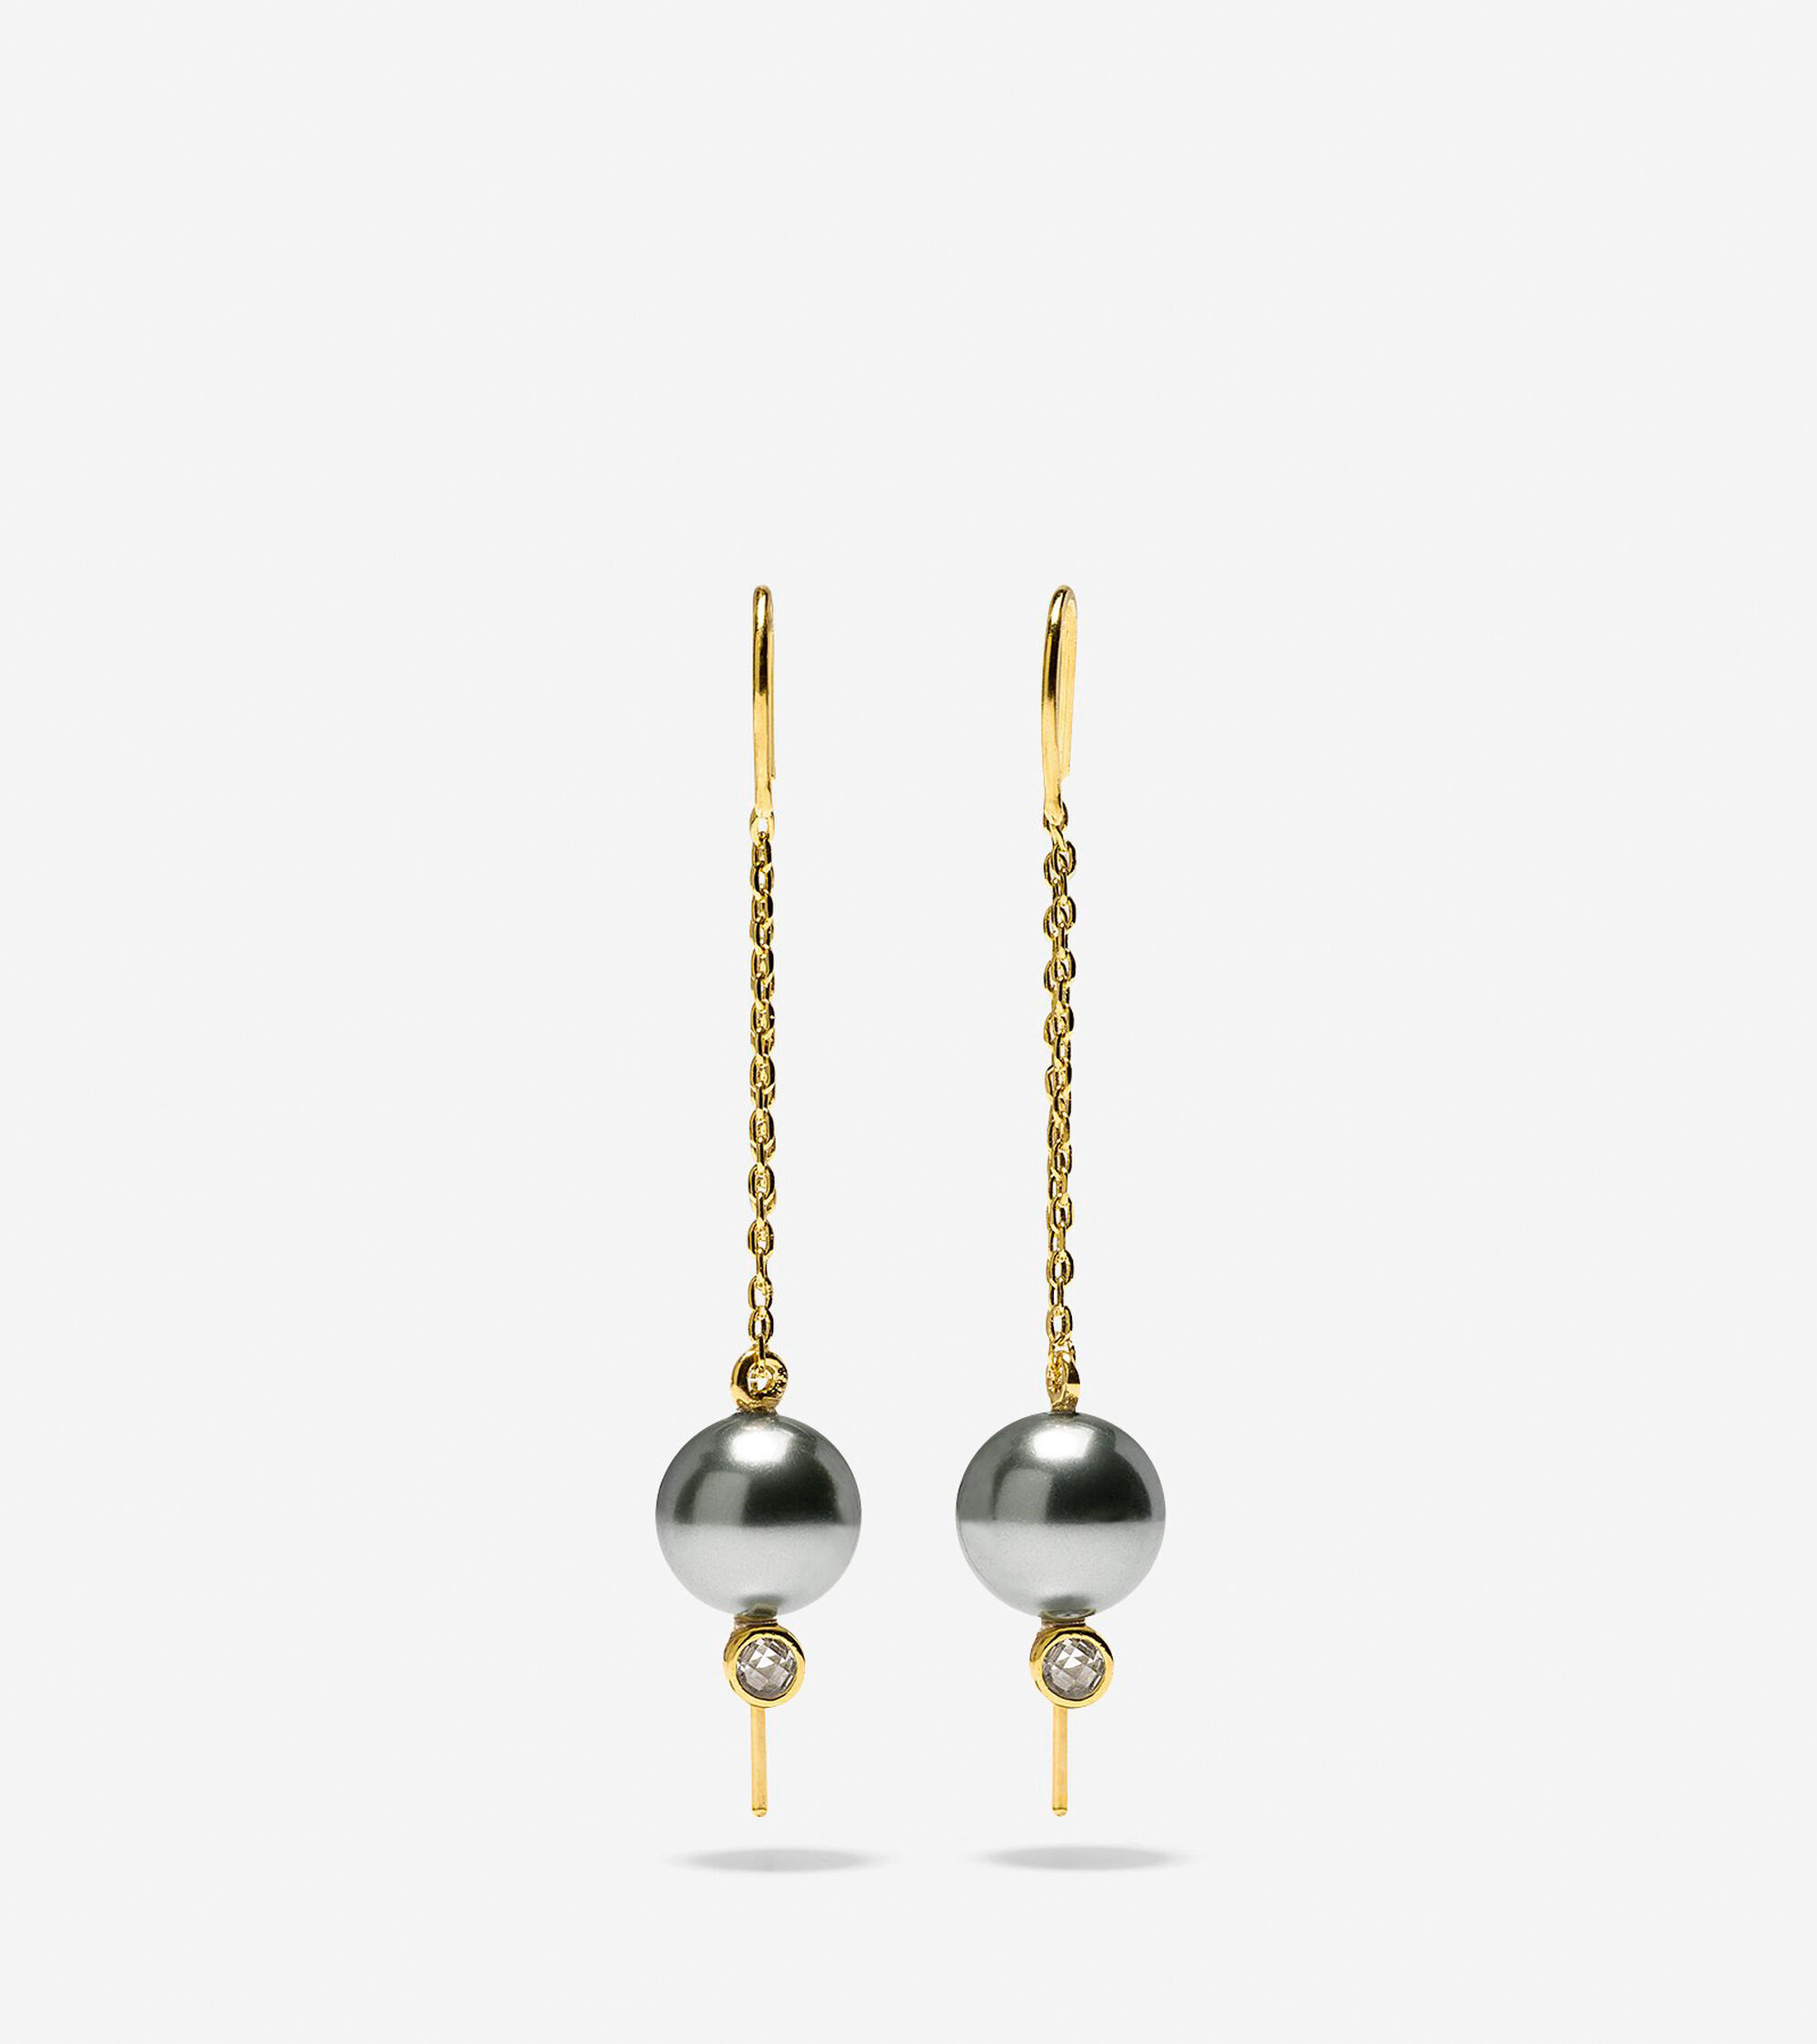 Starry Pearl Threader Earrings